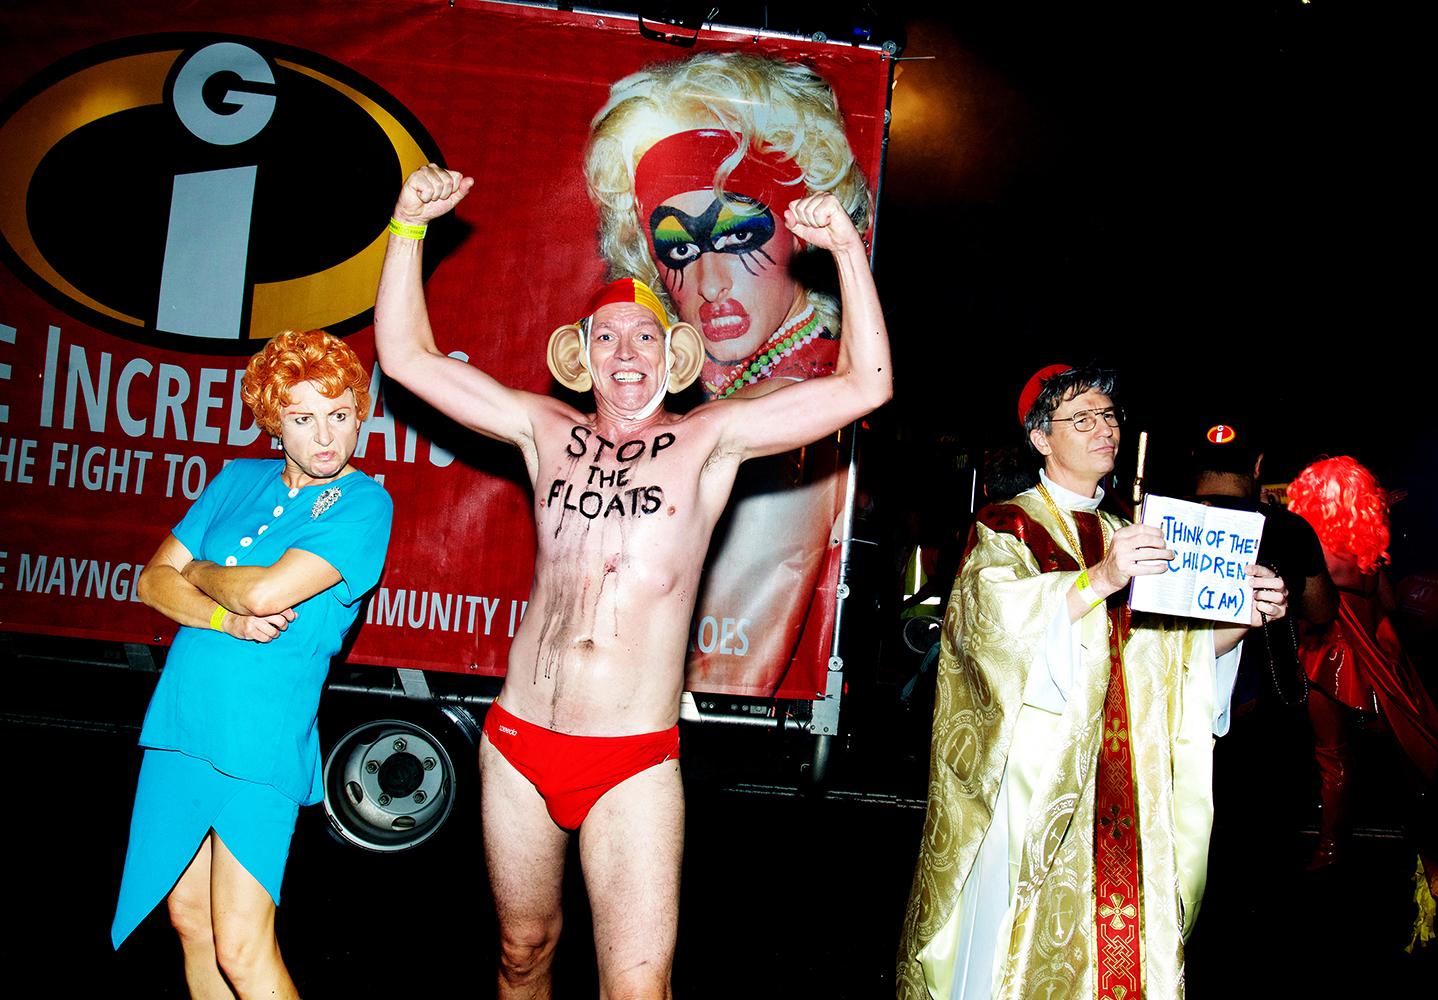 Gay and Lesbian Mardi Gras 2018. Popular villains of the day, Pauline Hanson, Tony Abbott, George Pell.